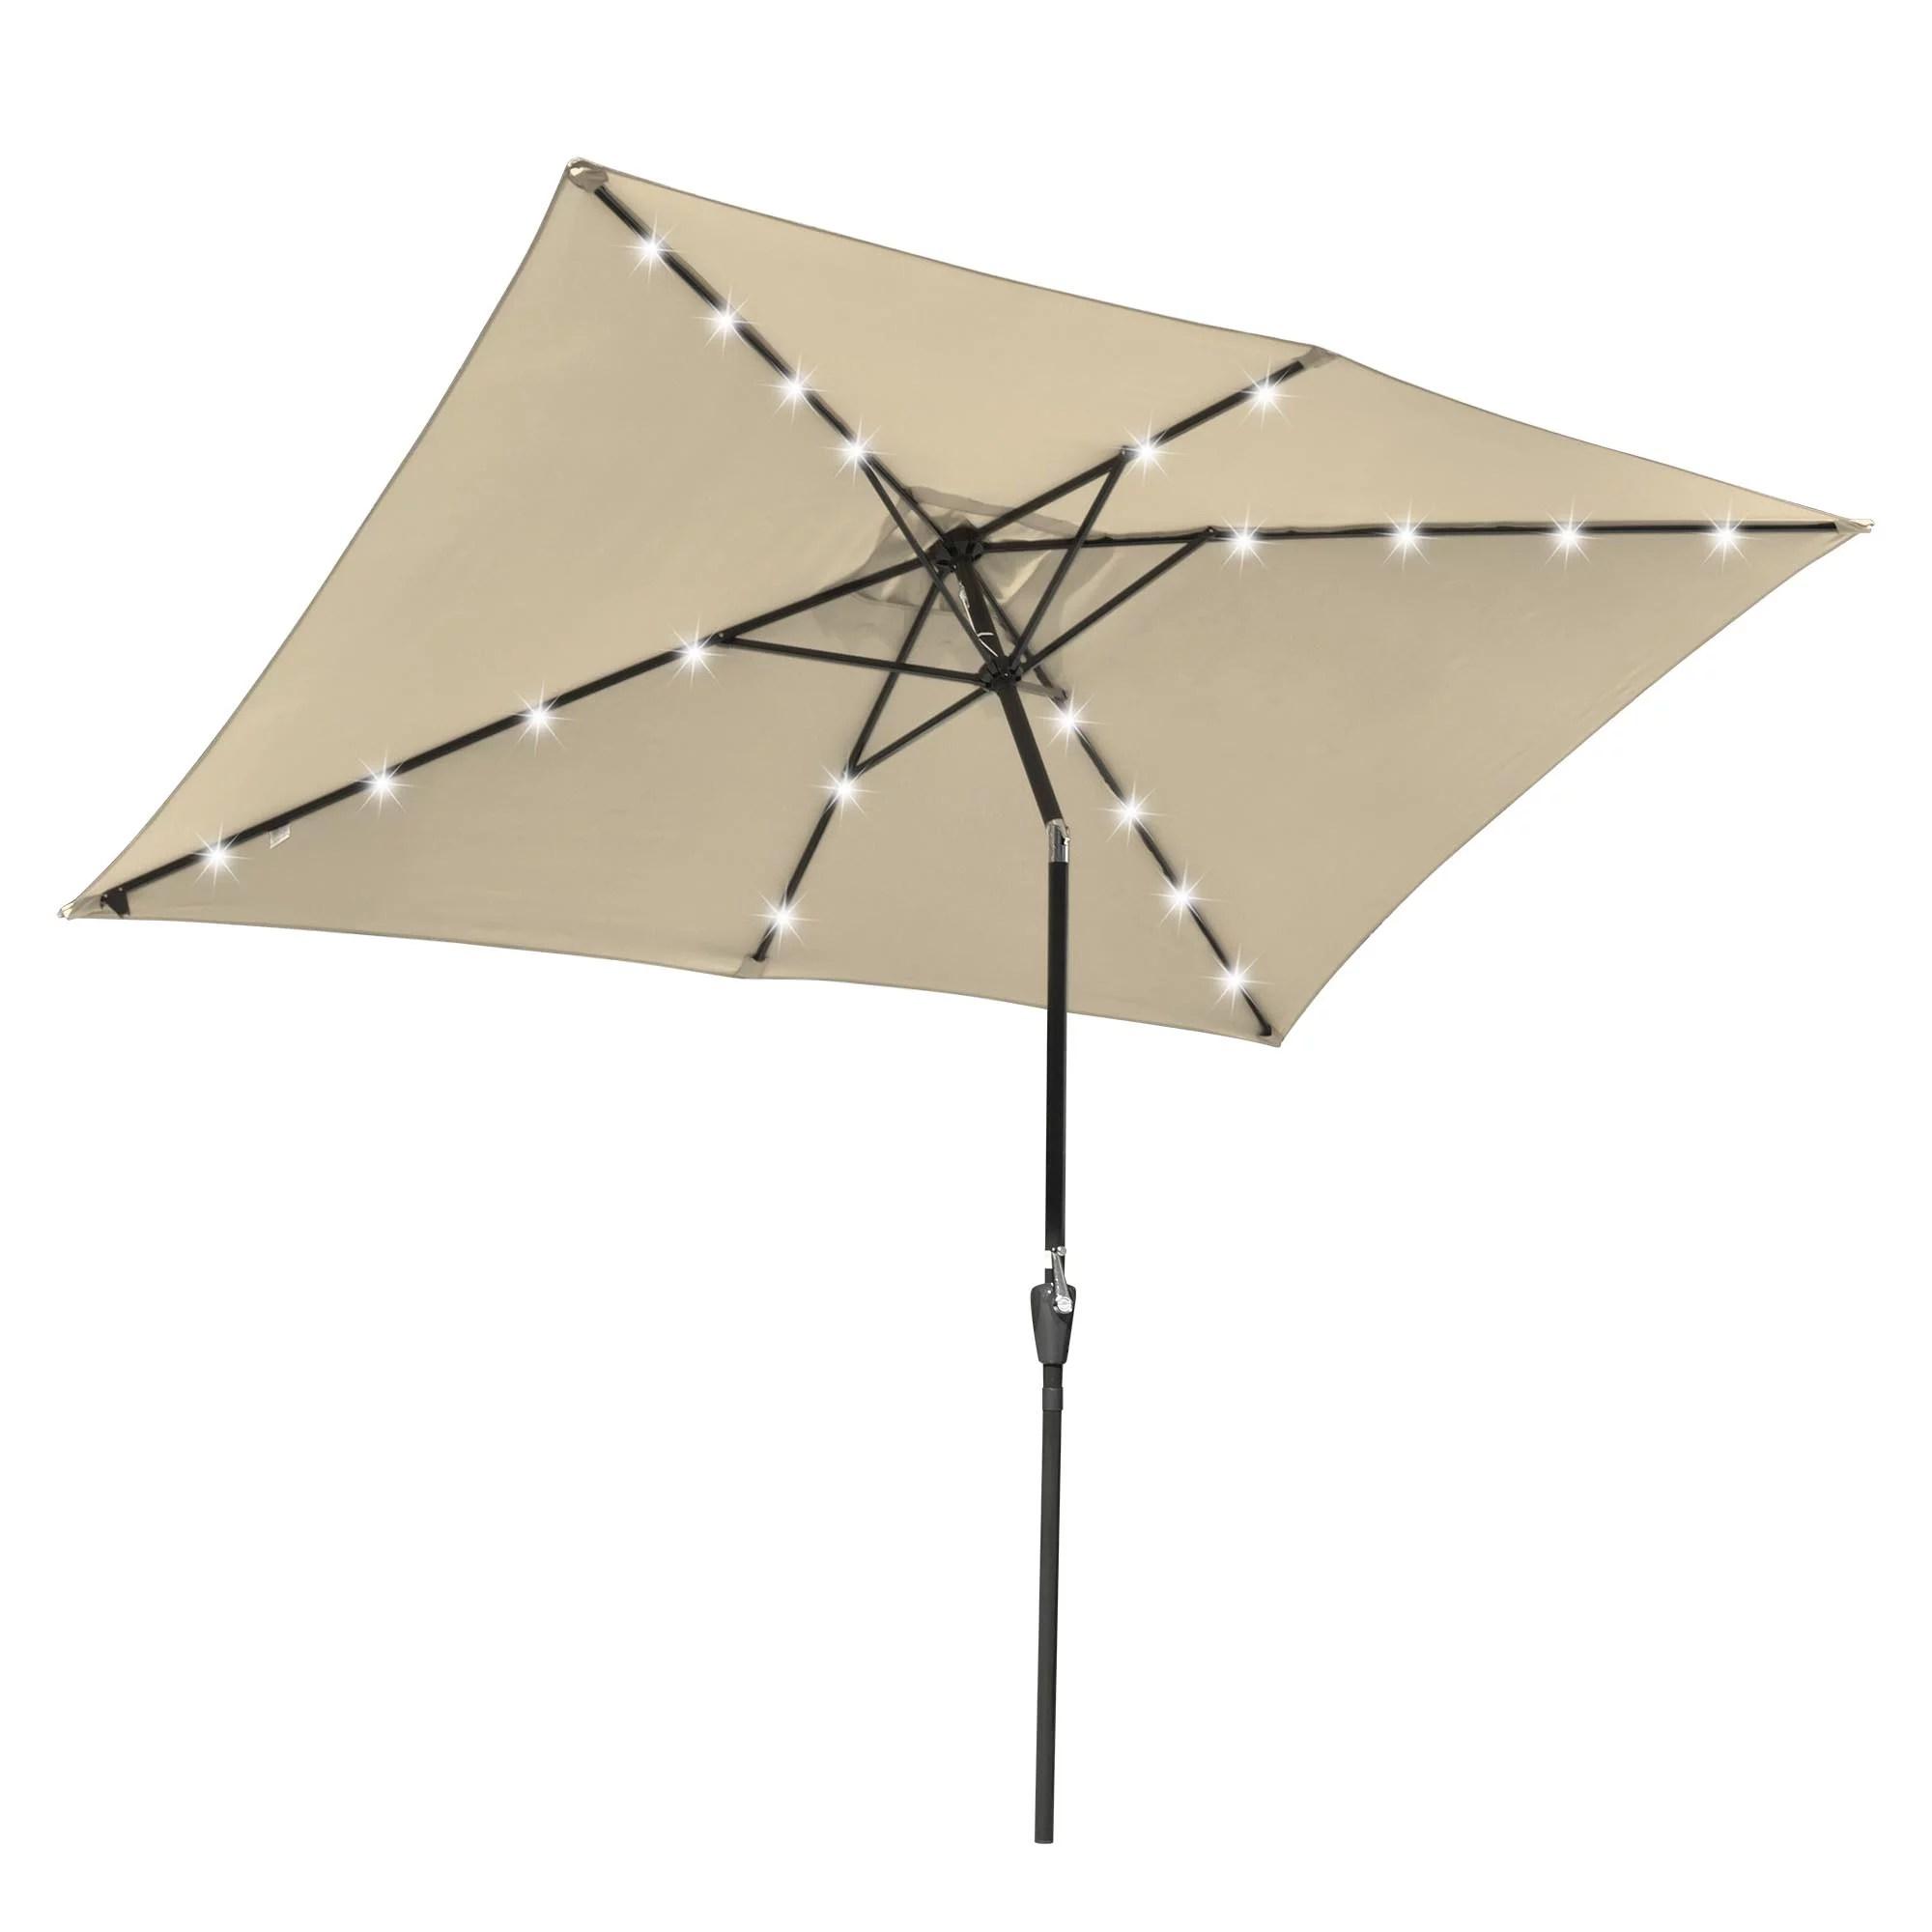 2x3m rectangle outdoor patio umbrella